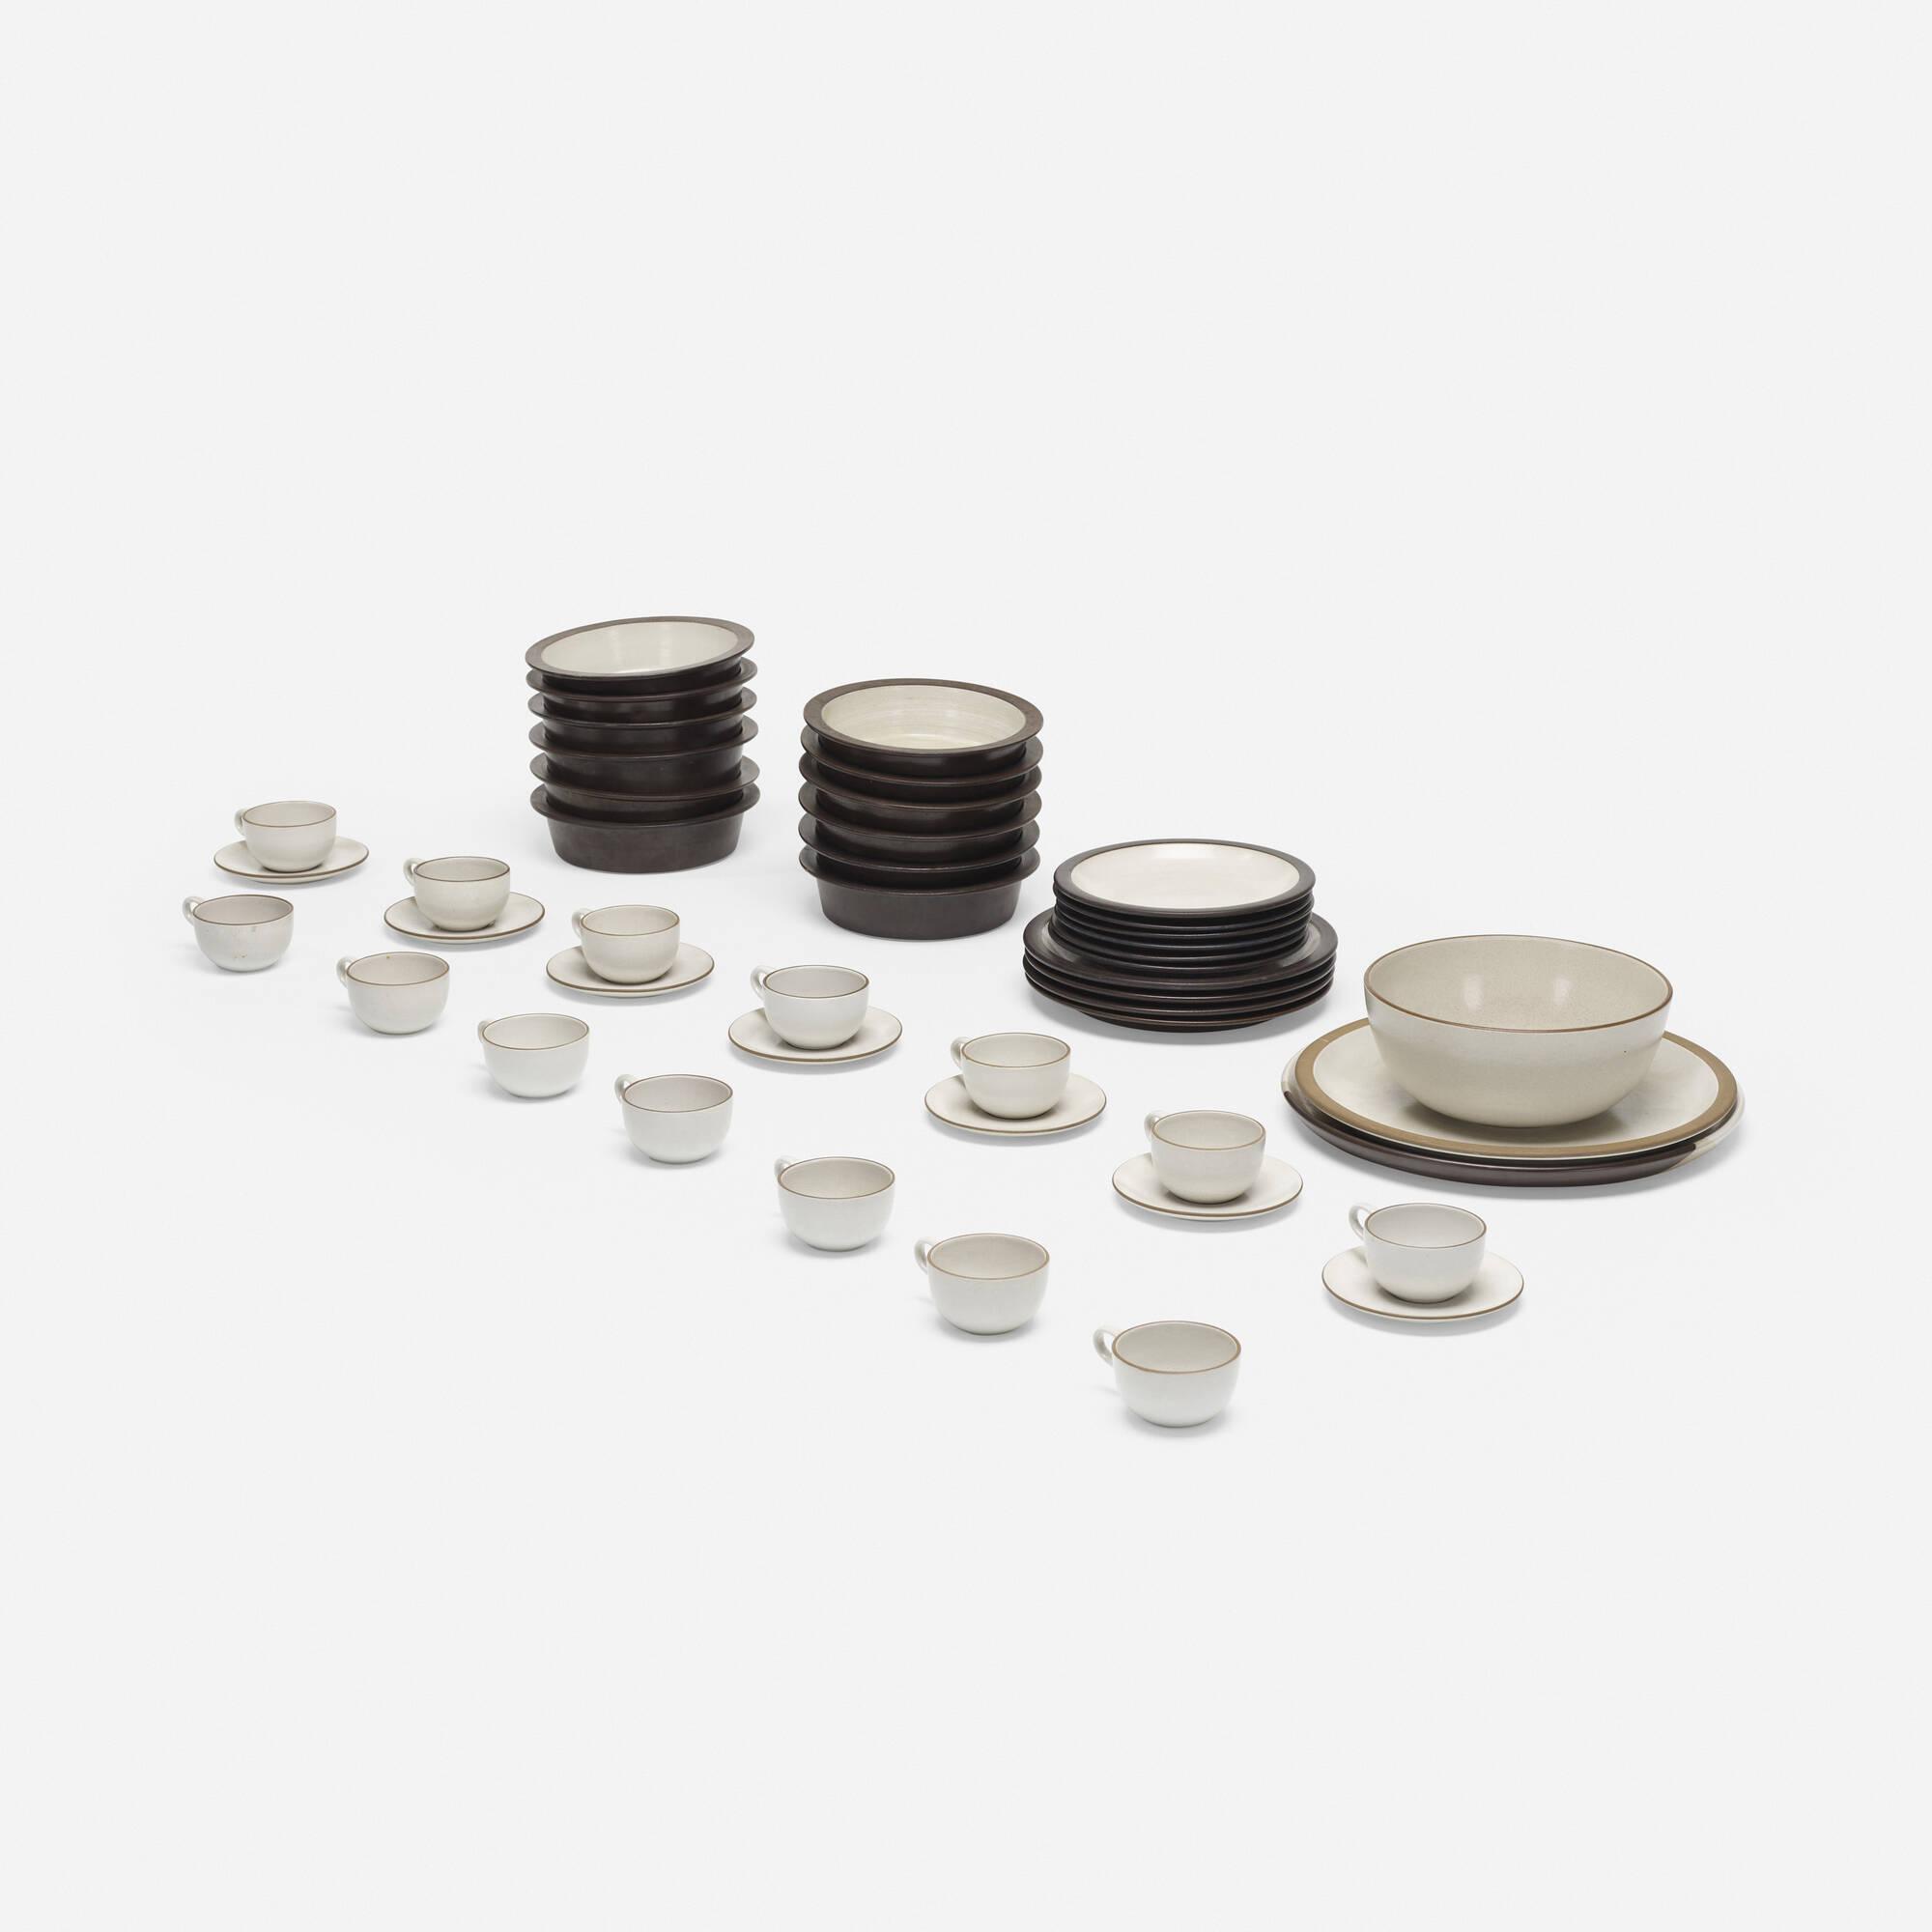 345: Heath / dinnerware collection (1 of 3)